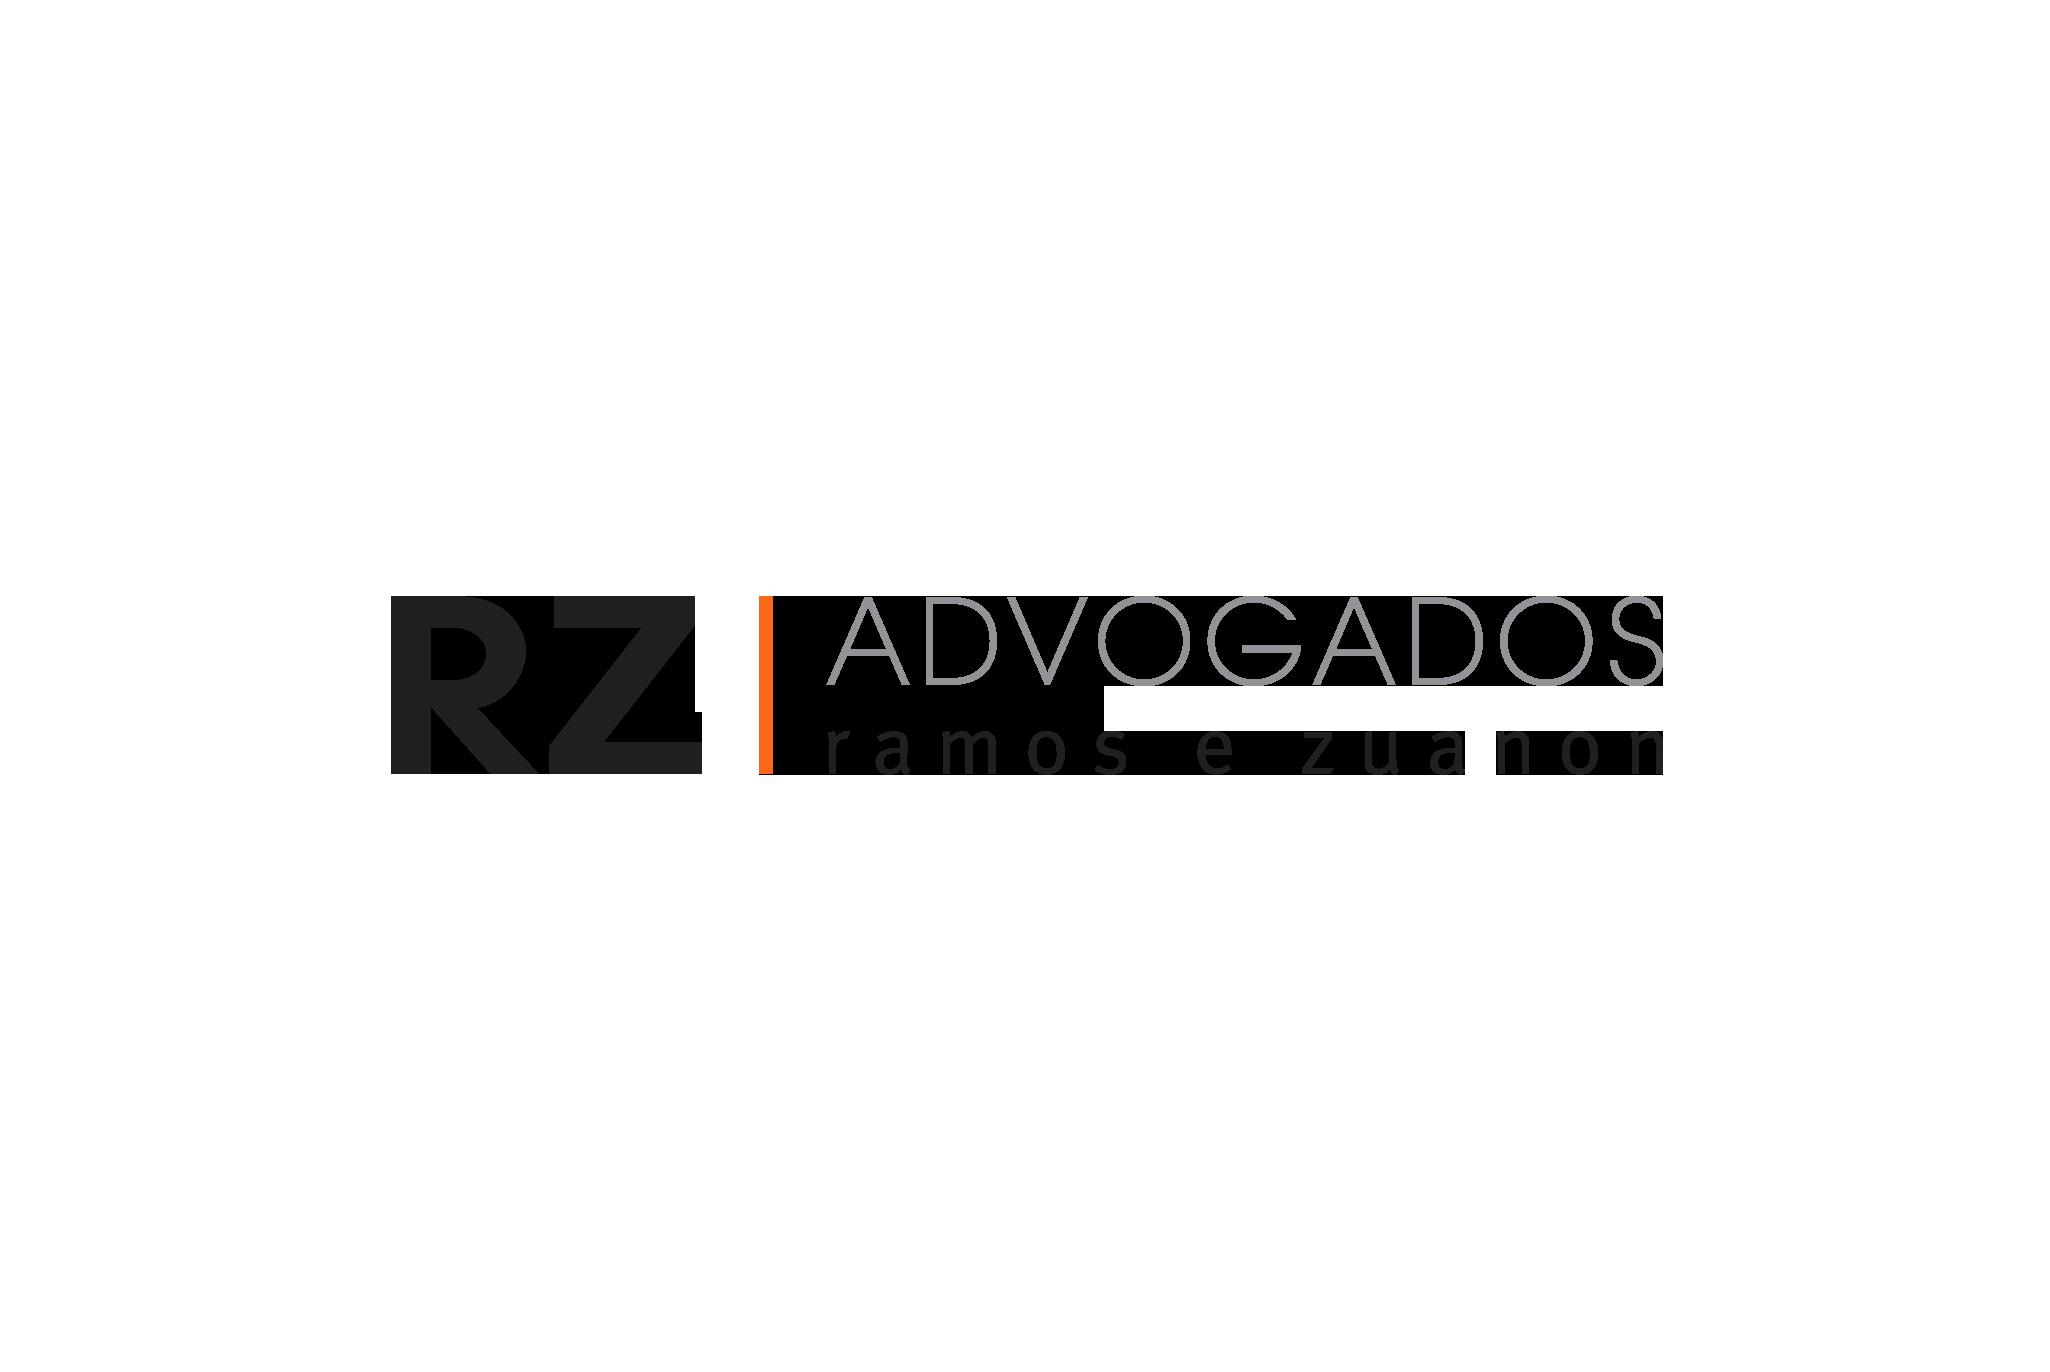 portfolio_marcas_rz_advogados